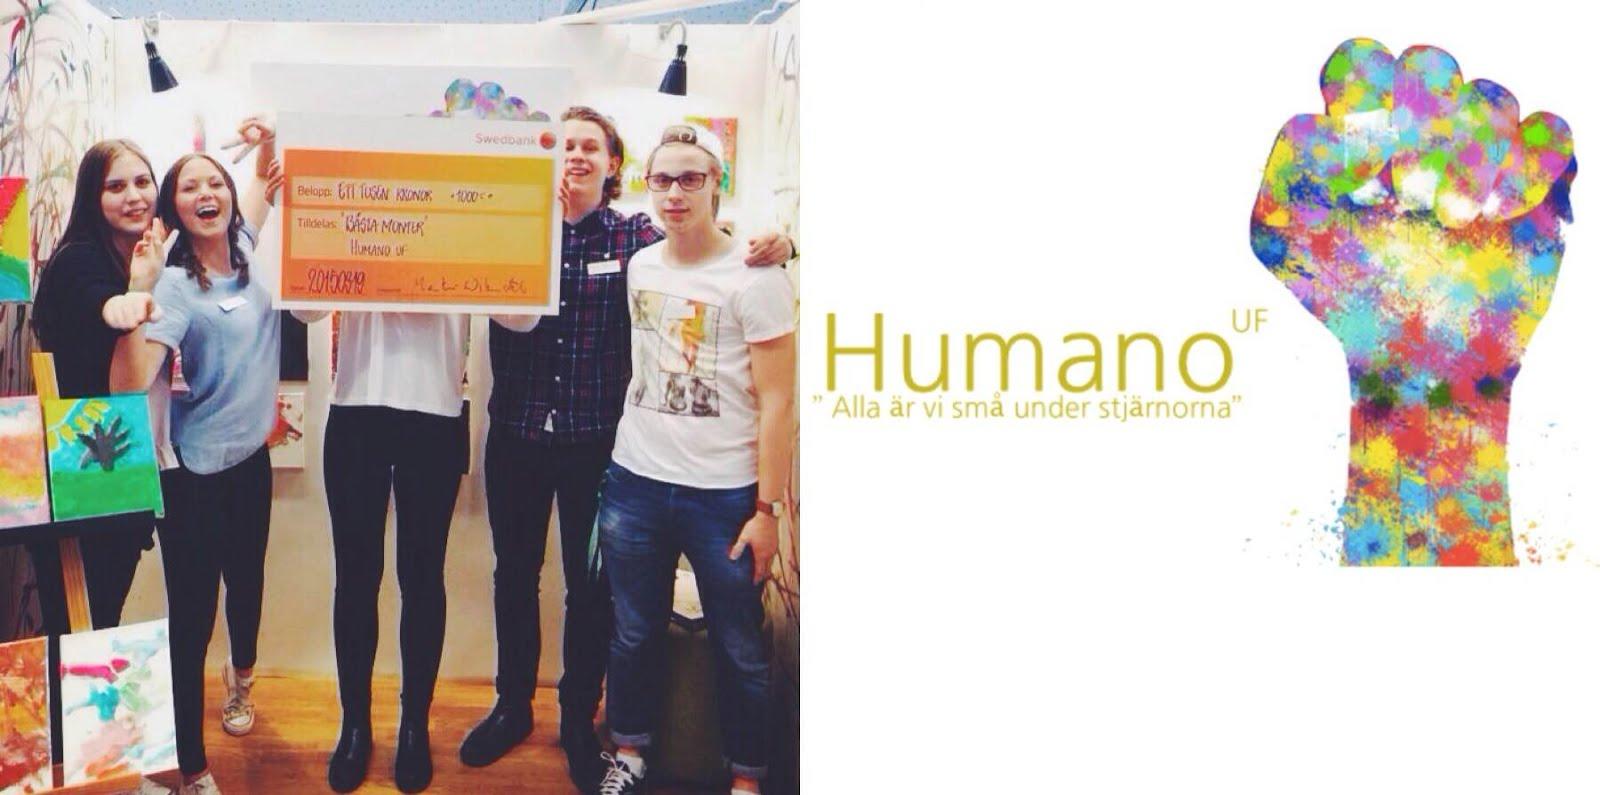 Humano UF